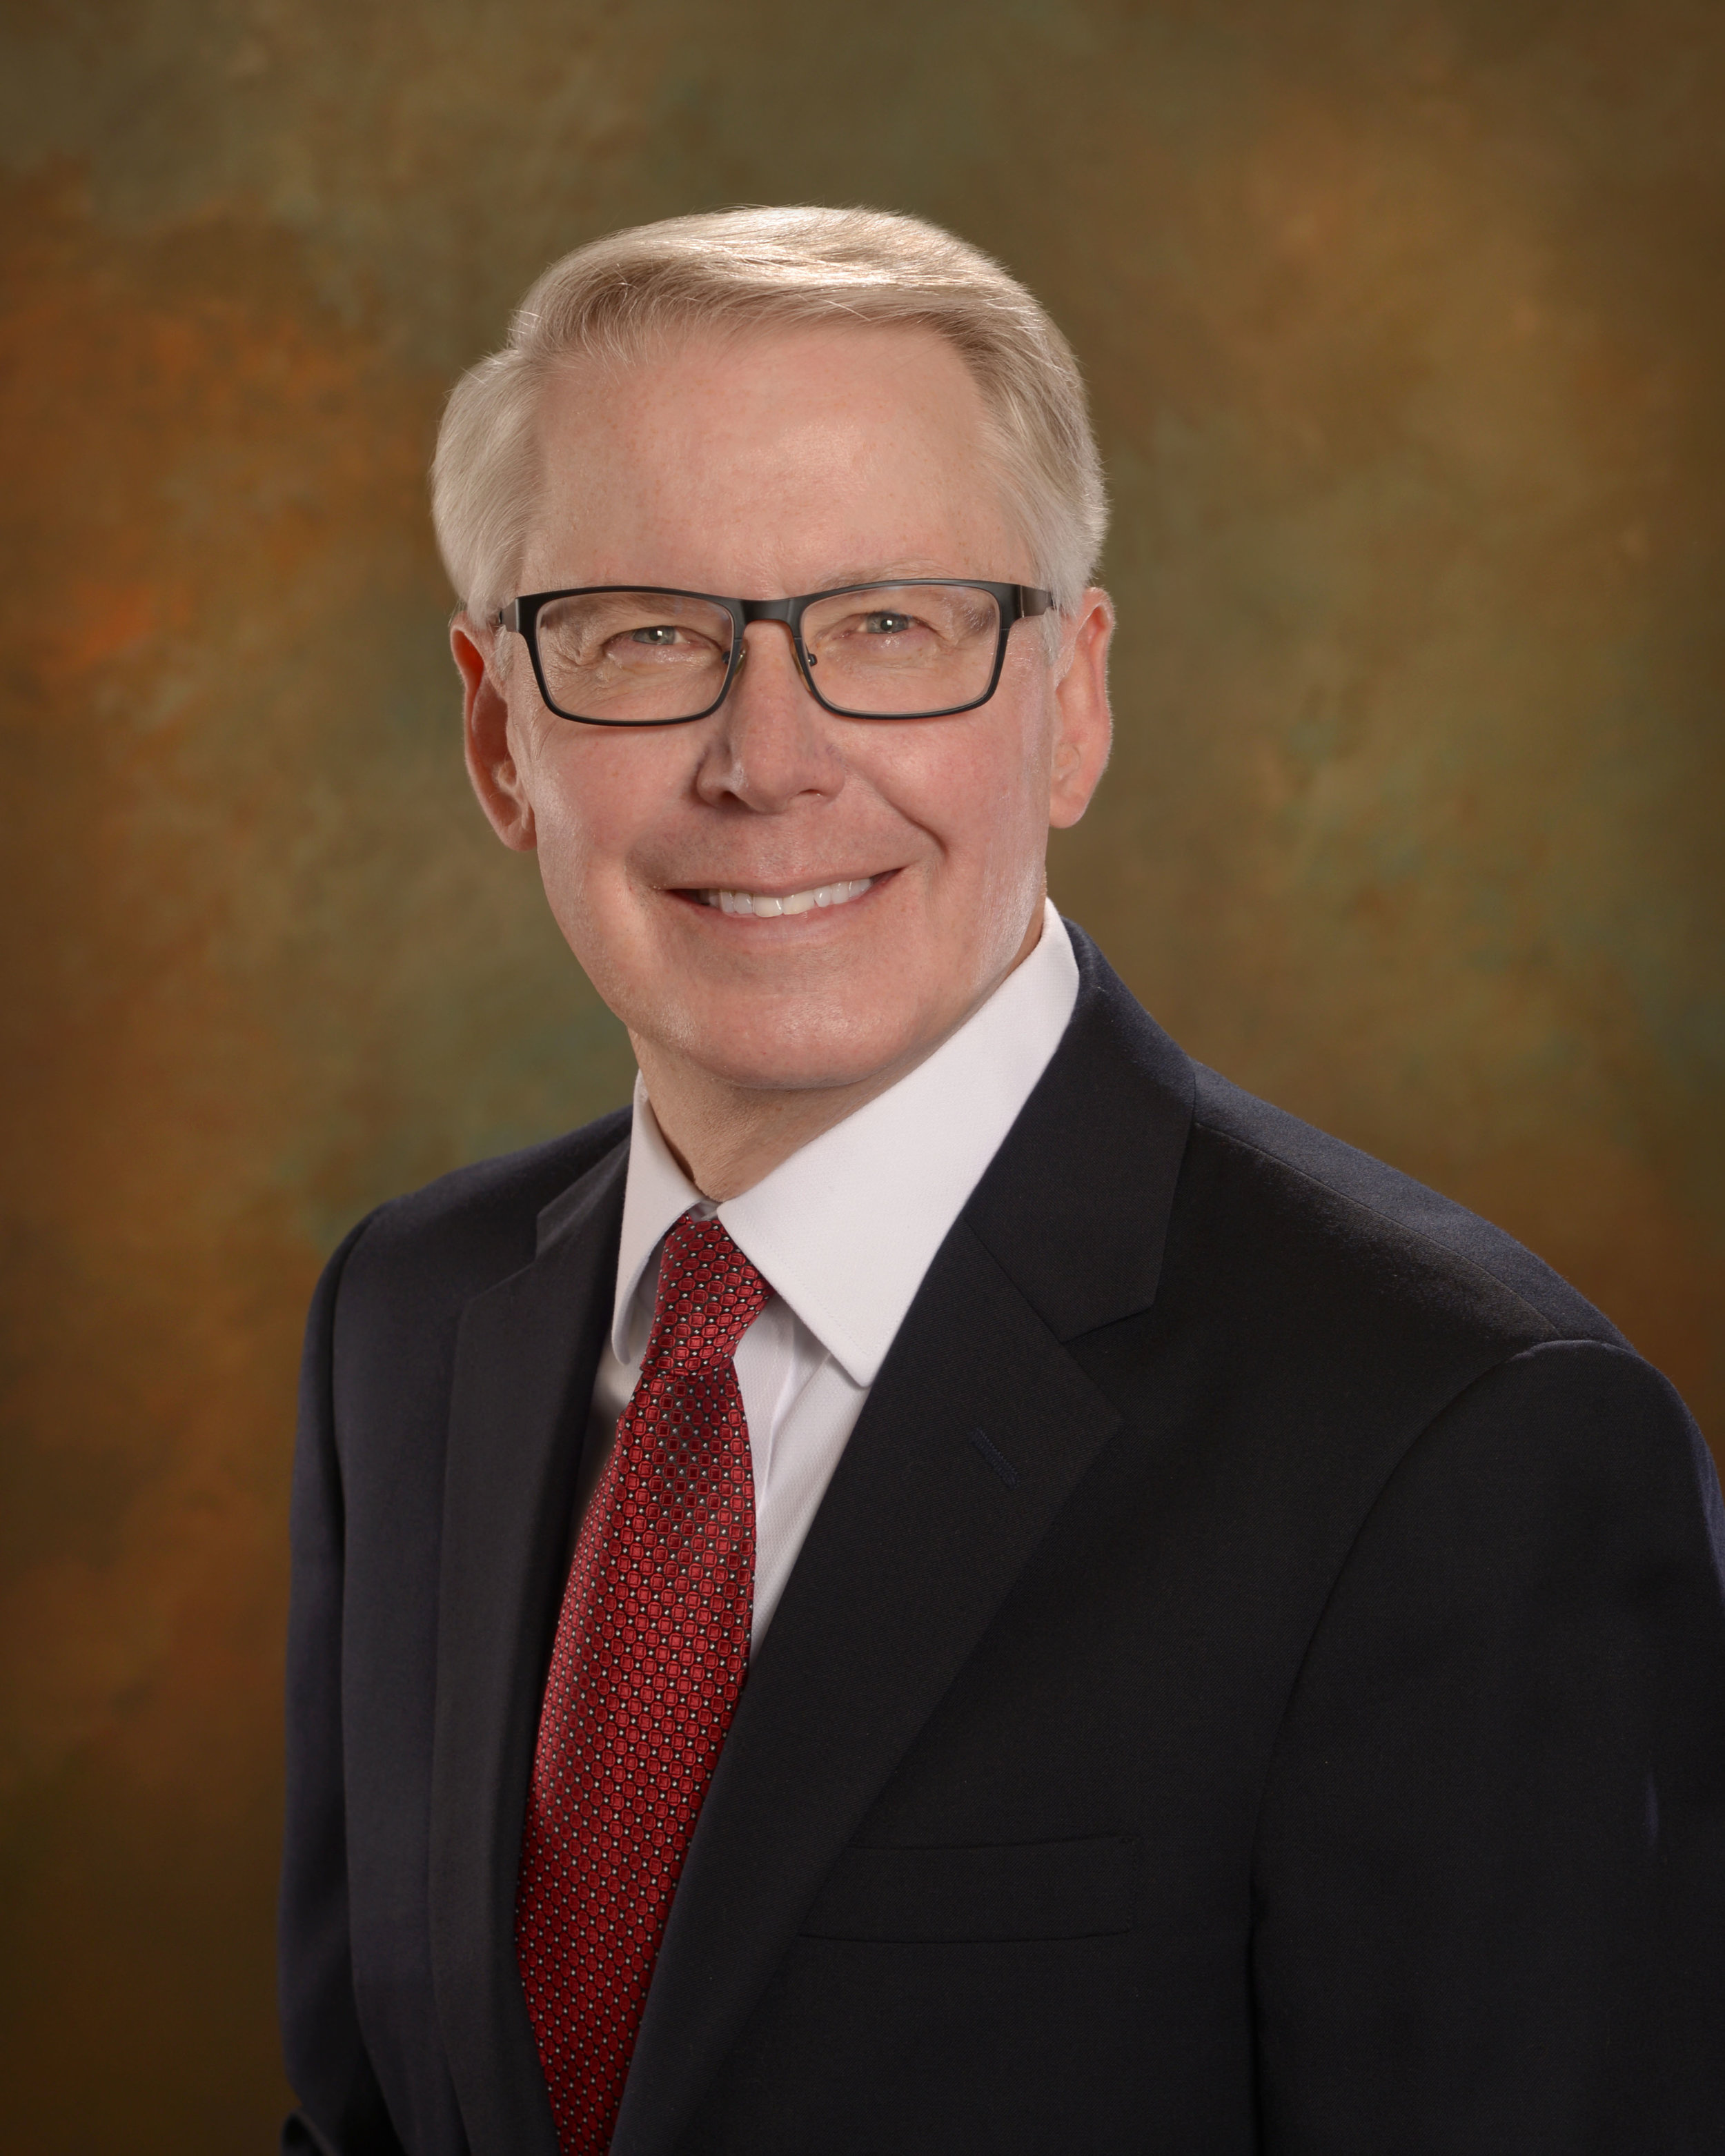 Alan Gayle, President of Via Nova Investment Management